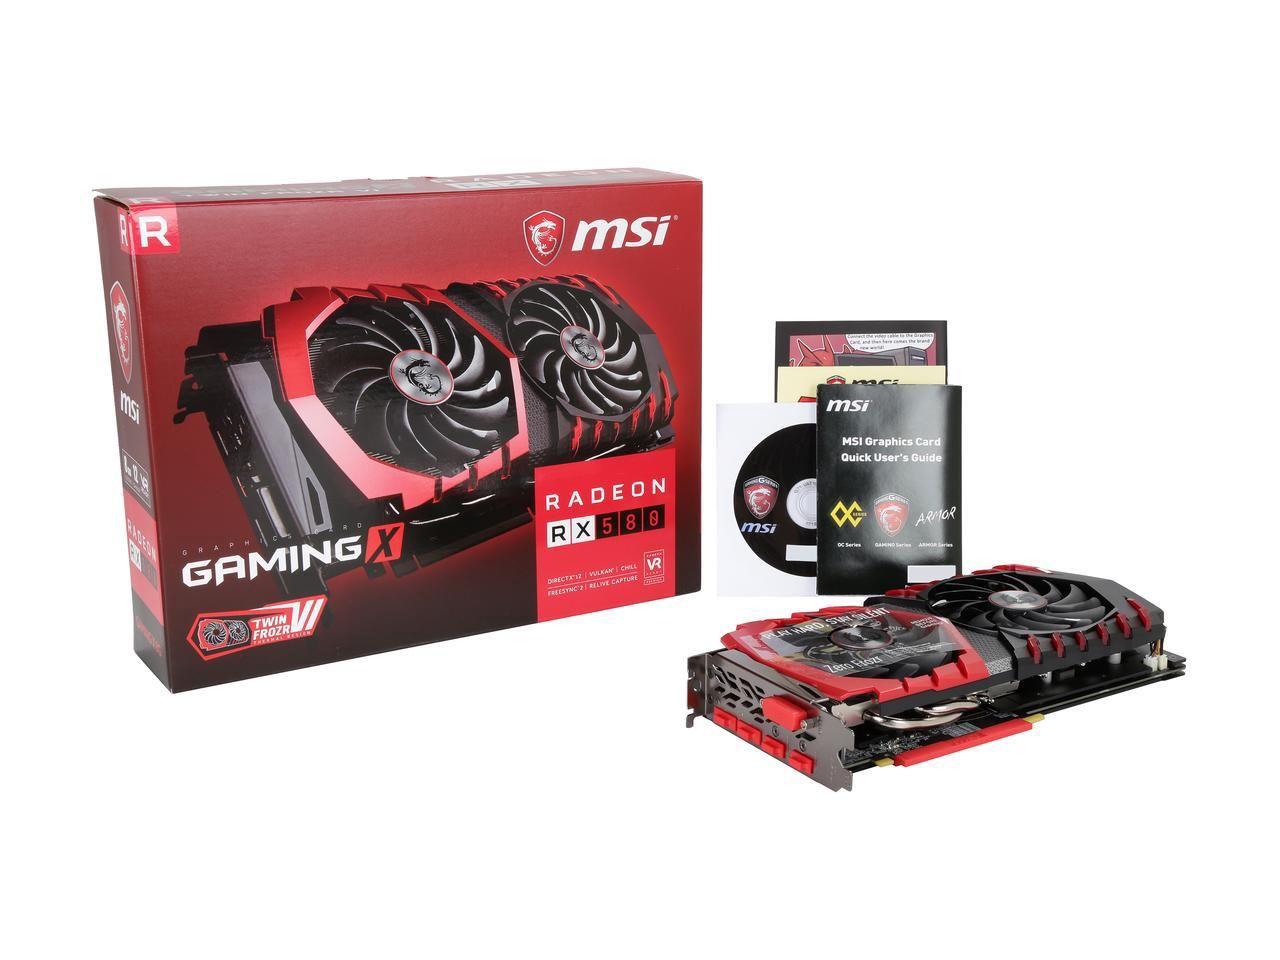 MSI Radeon RX 580 DirectX 12 RX 580 GAMING X 8G 8GB 256-Bit GDDR5